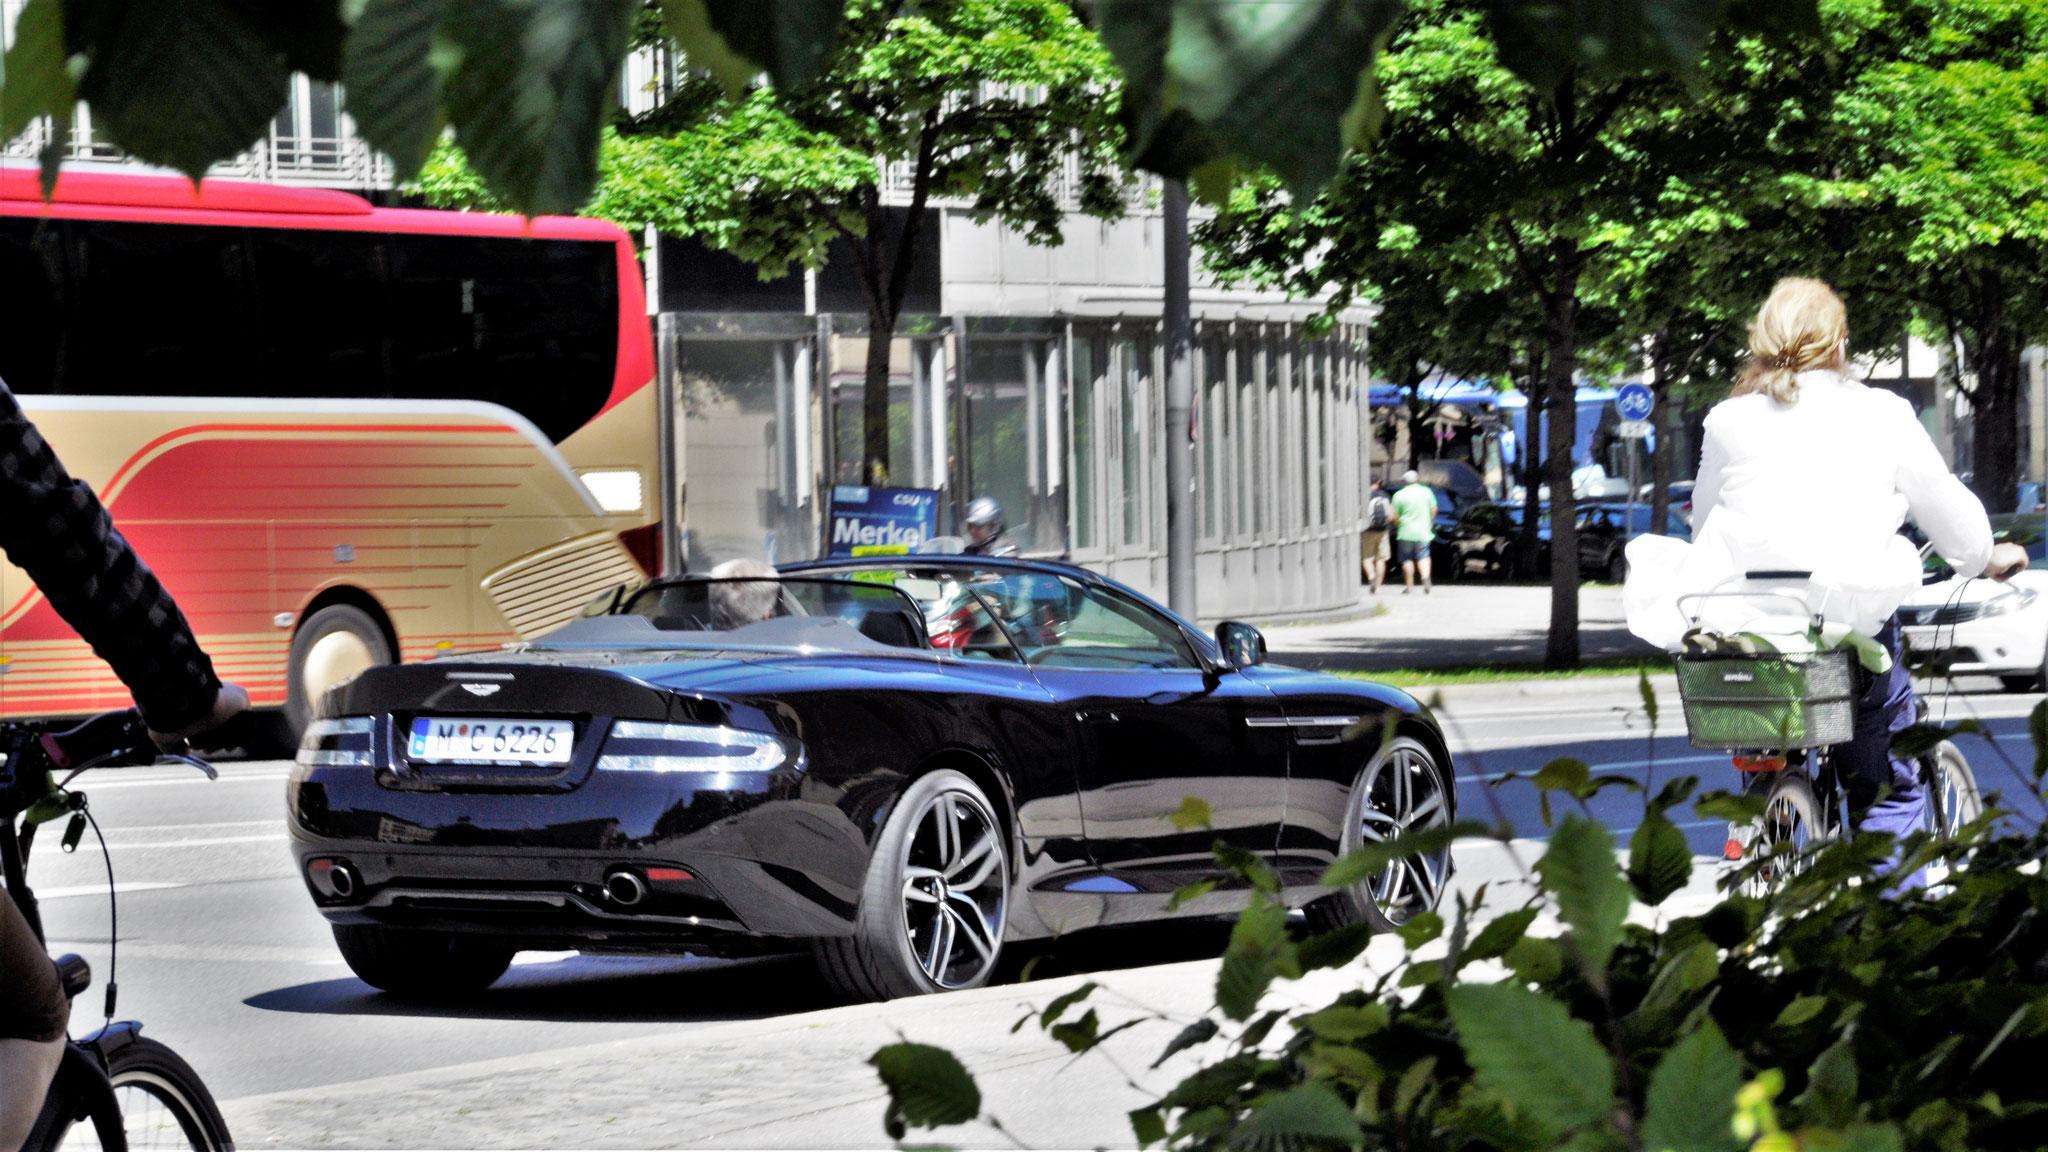 Aston Martin DB9 GT Volante - M-C-6226